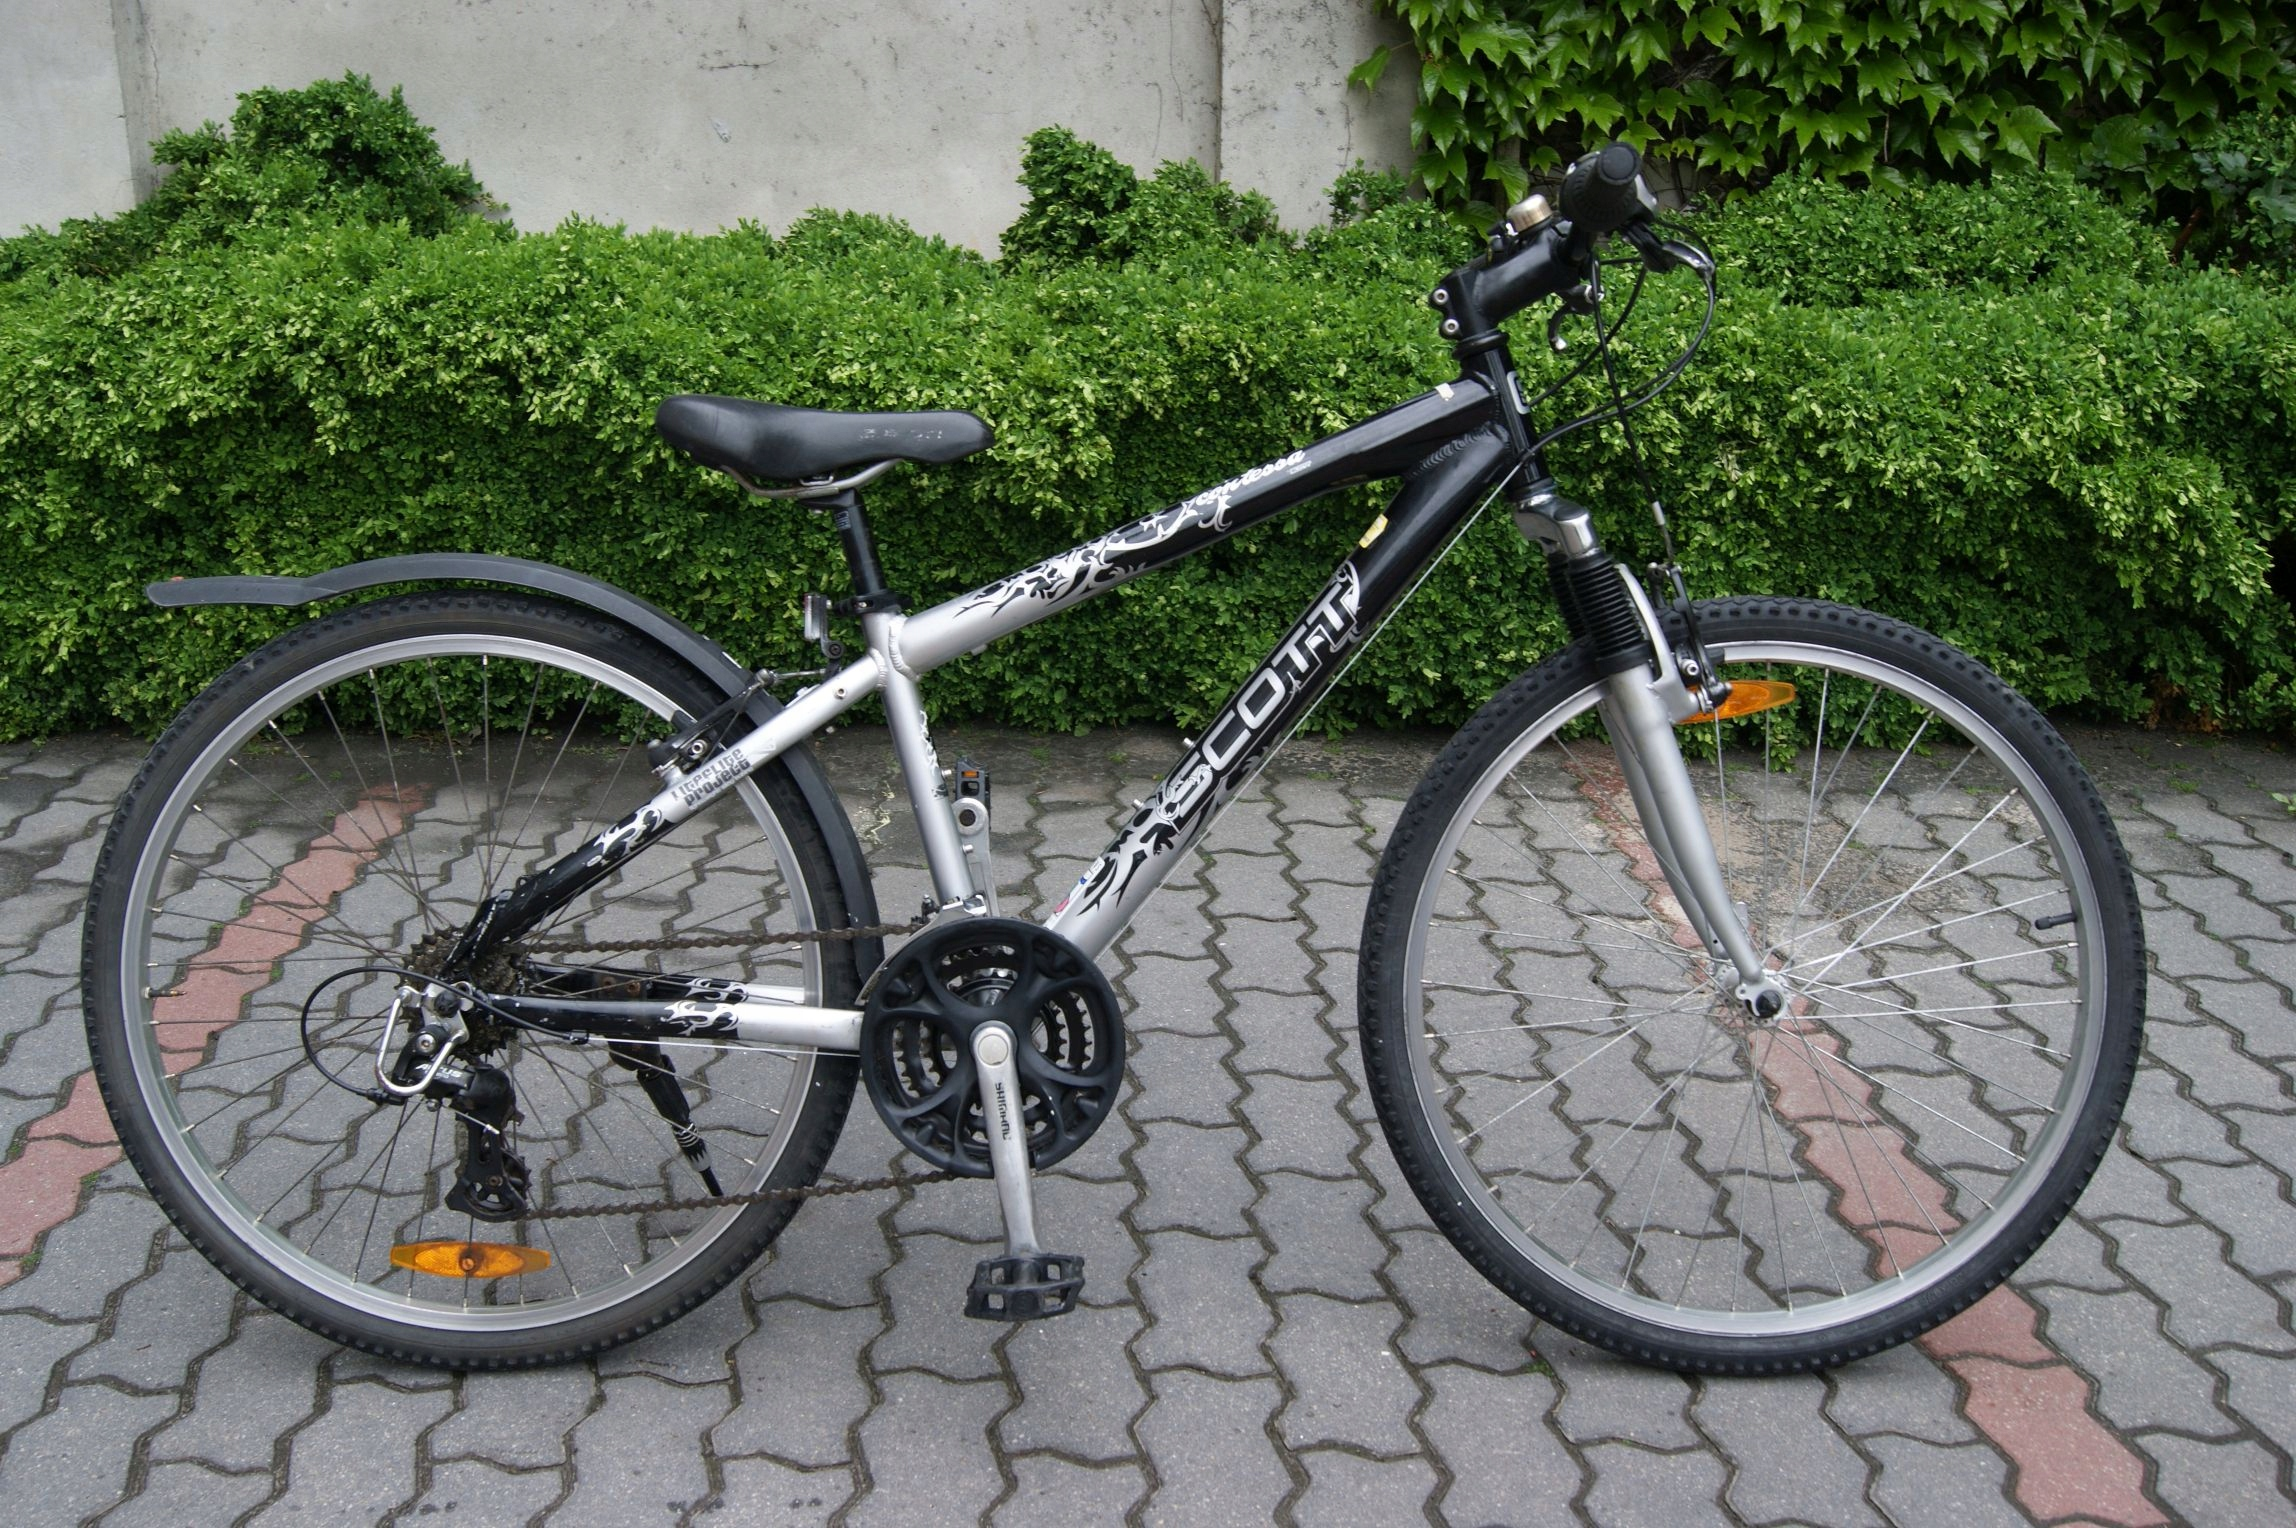 R340 Aluminiowy rower MTB górski SCOTT koła 26''